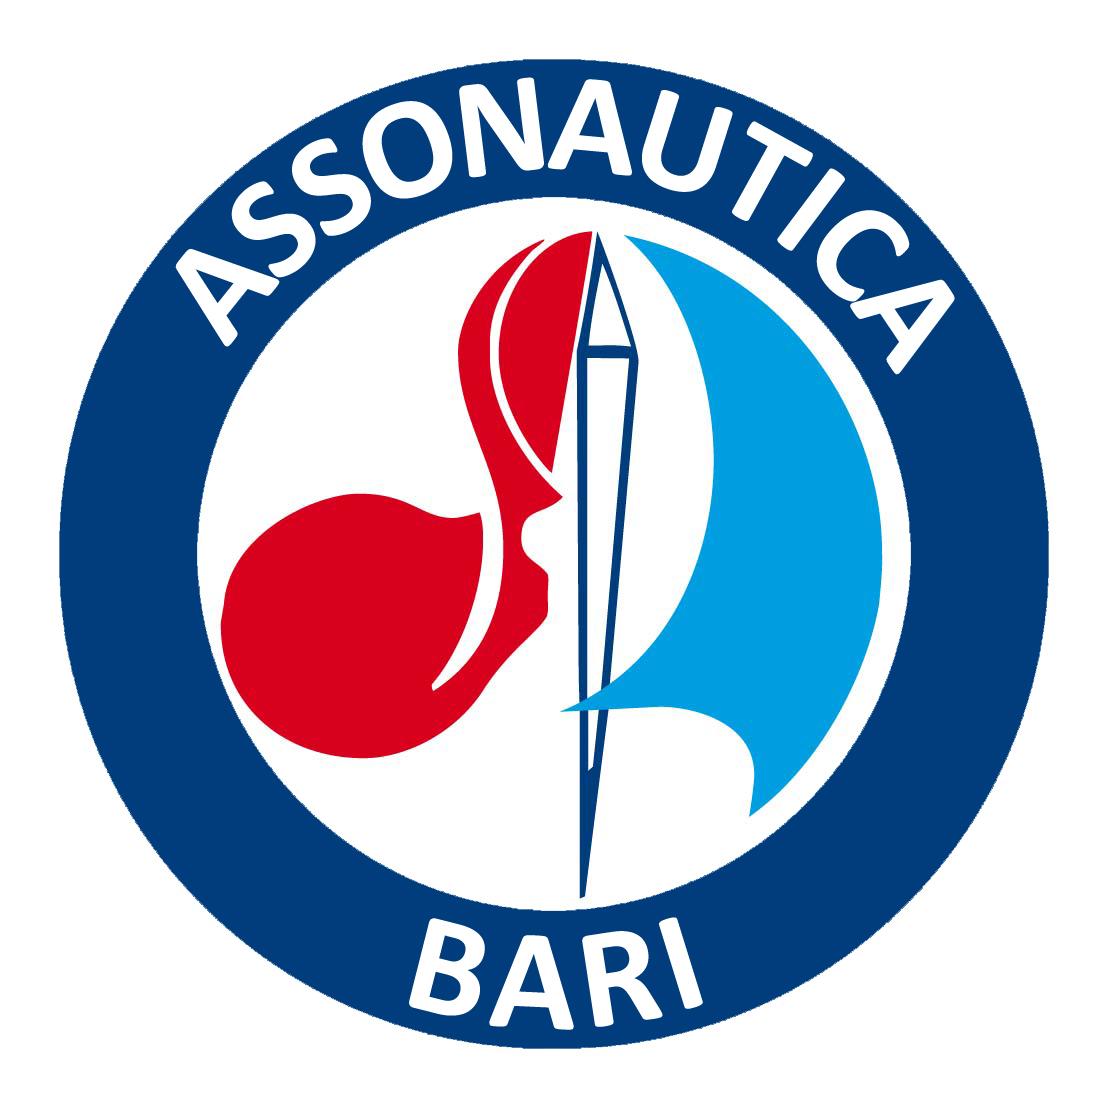 logo assonautica bari